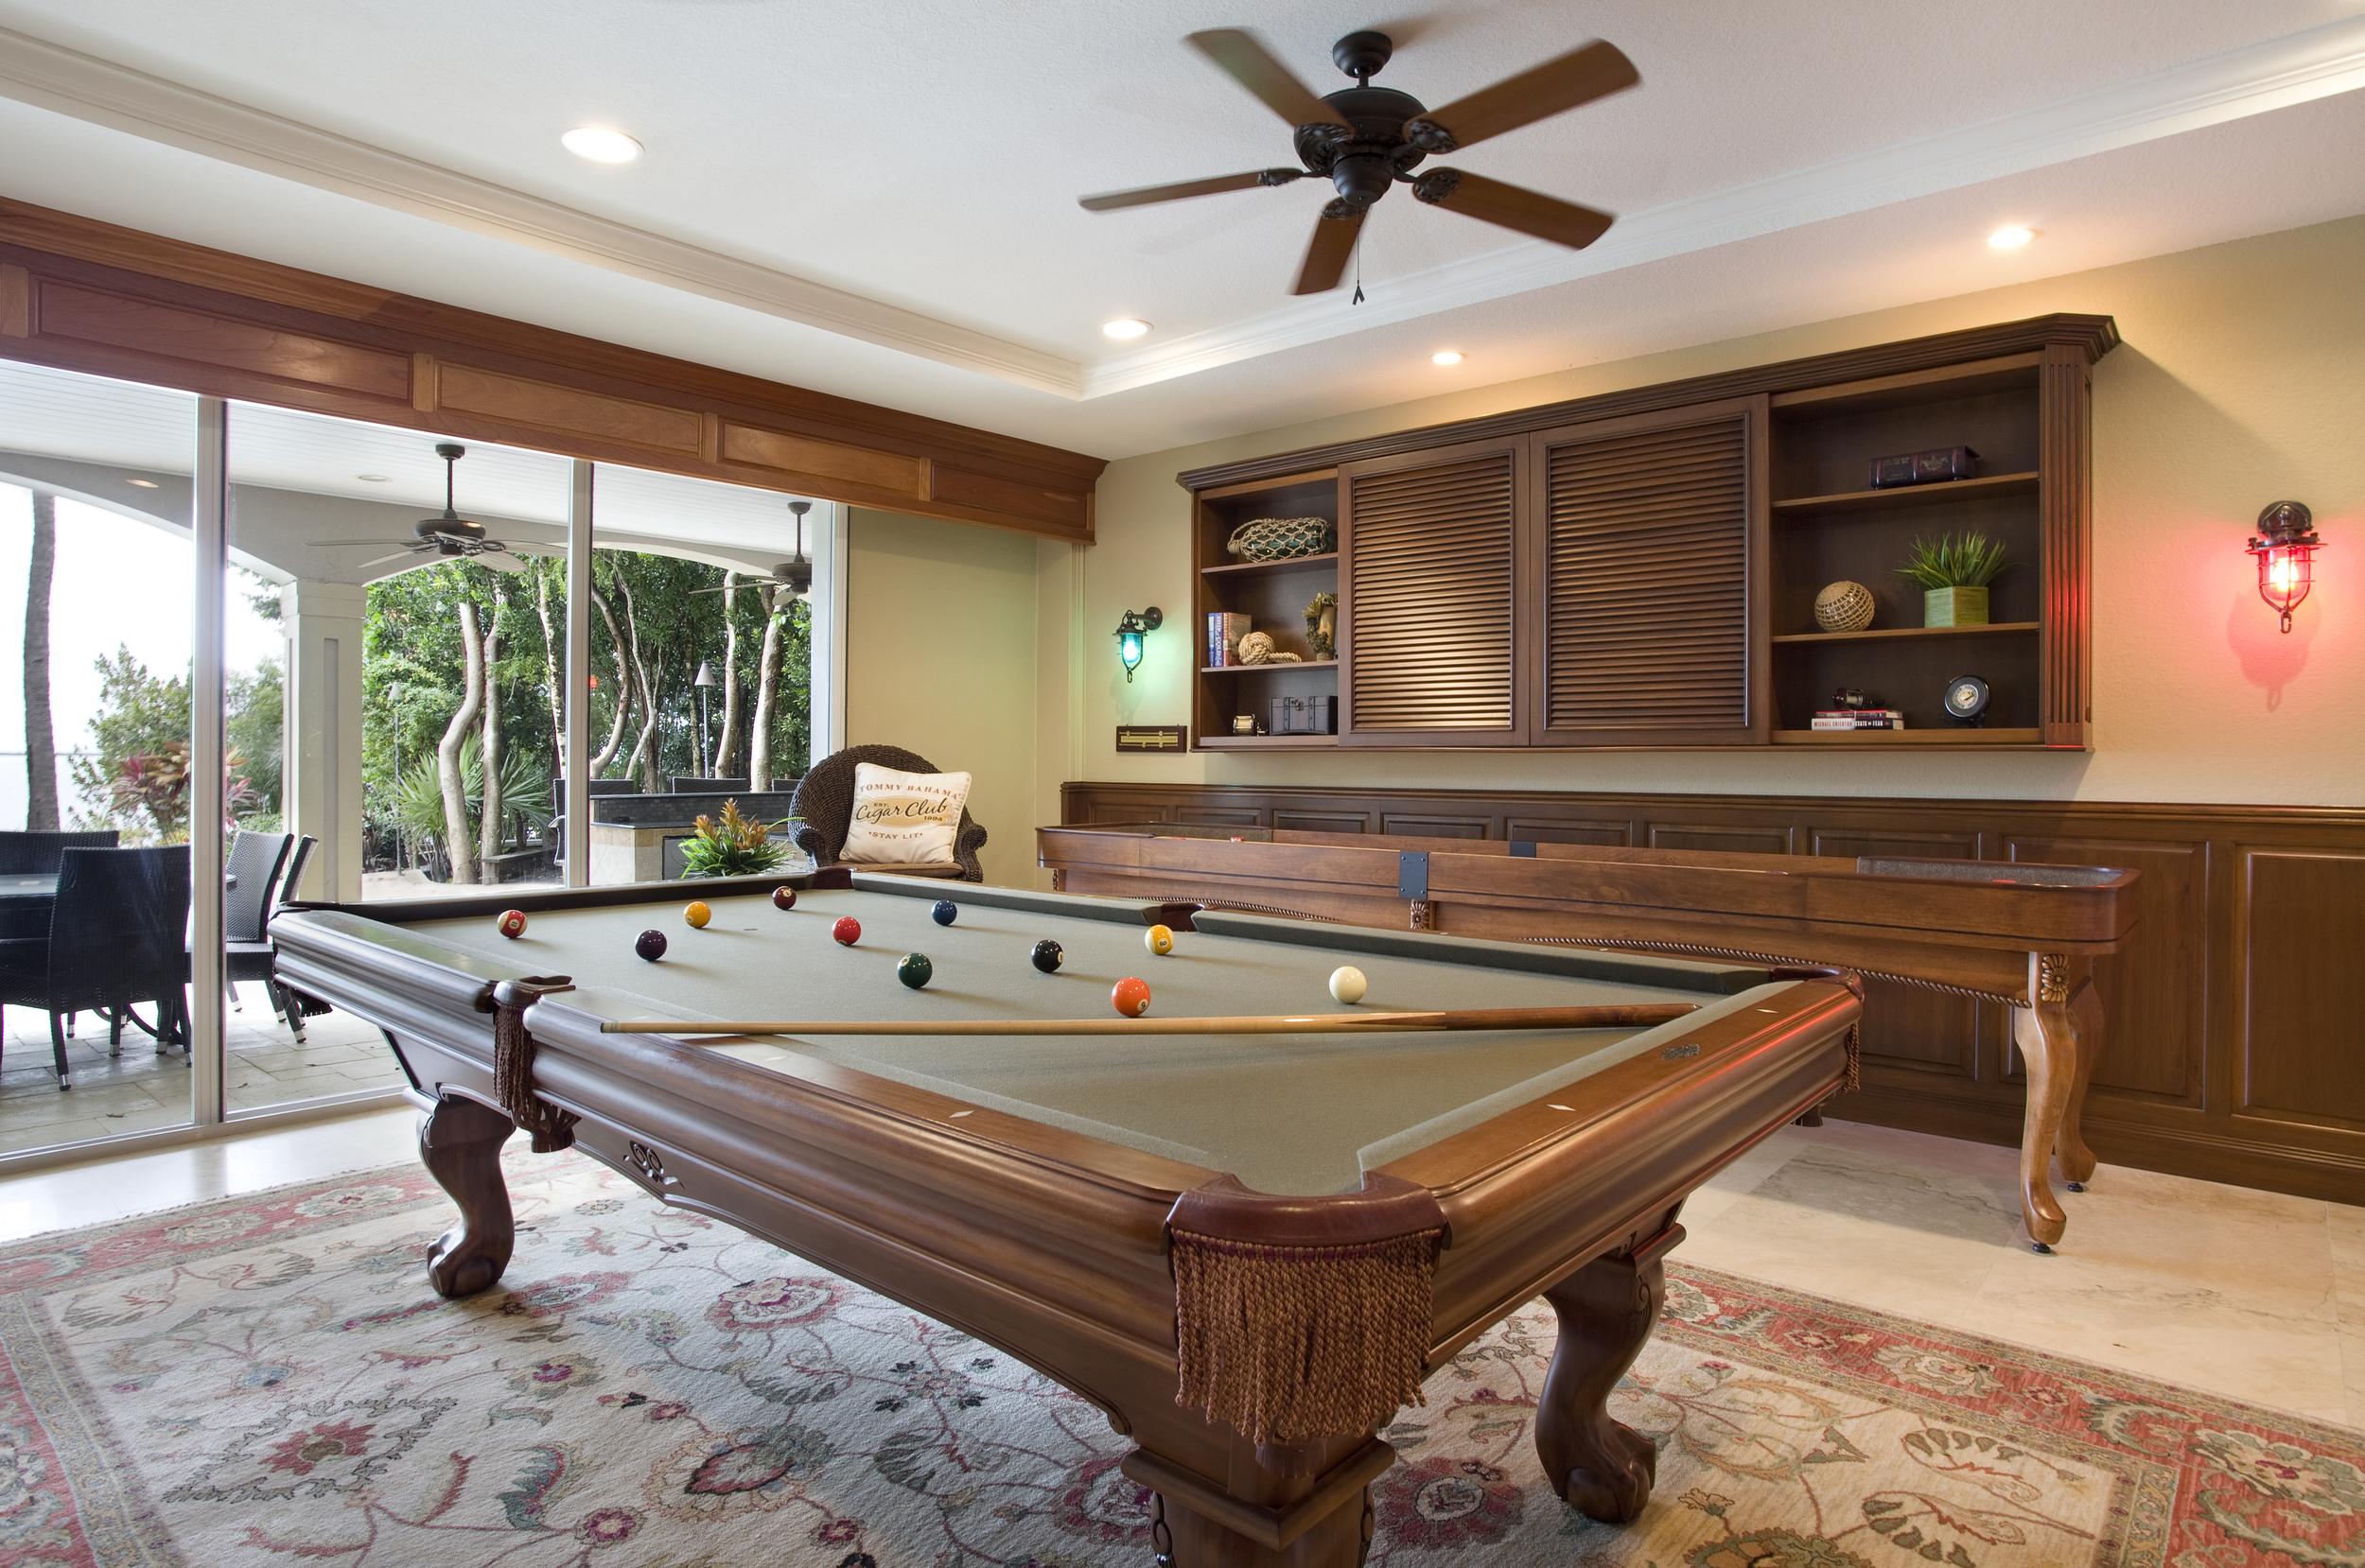 Mau KL Billiard 2.jpg